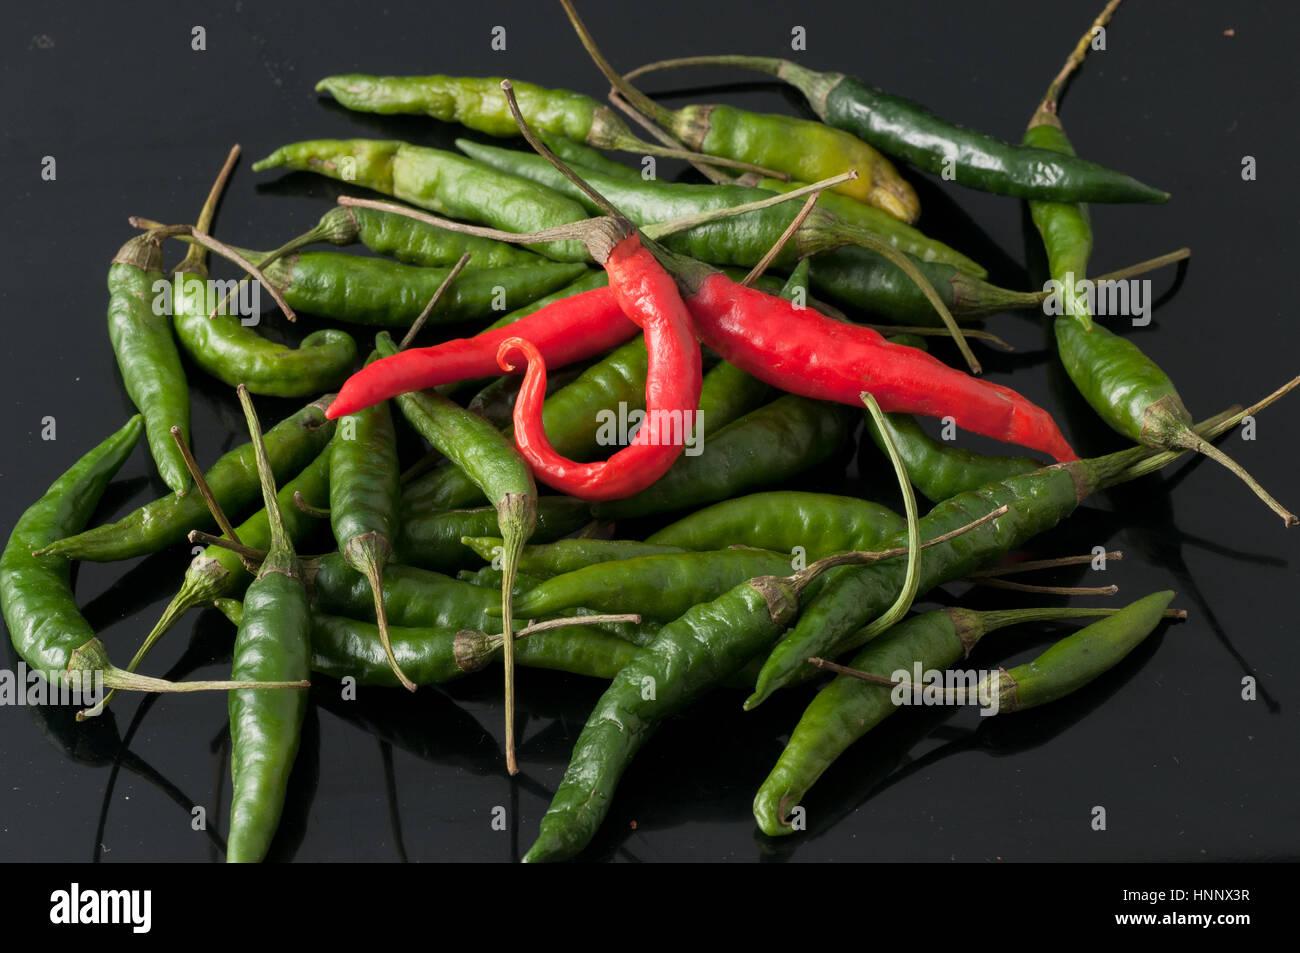 Piment vert et rouge Photo Stock